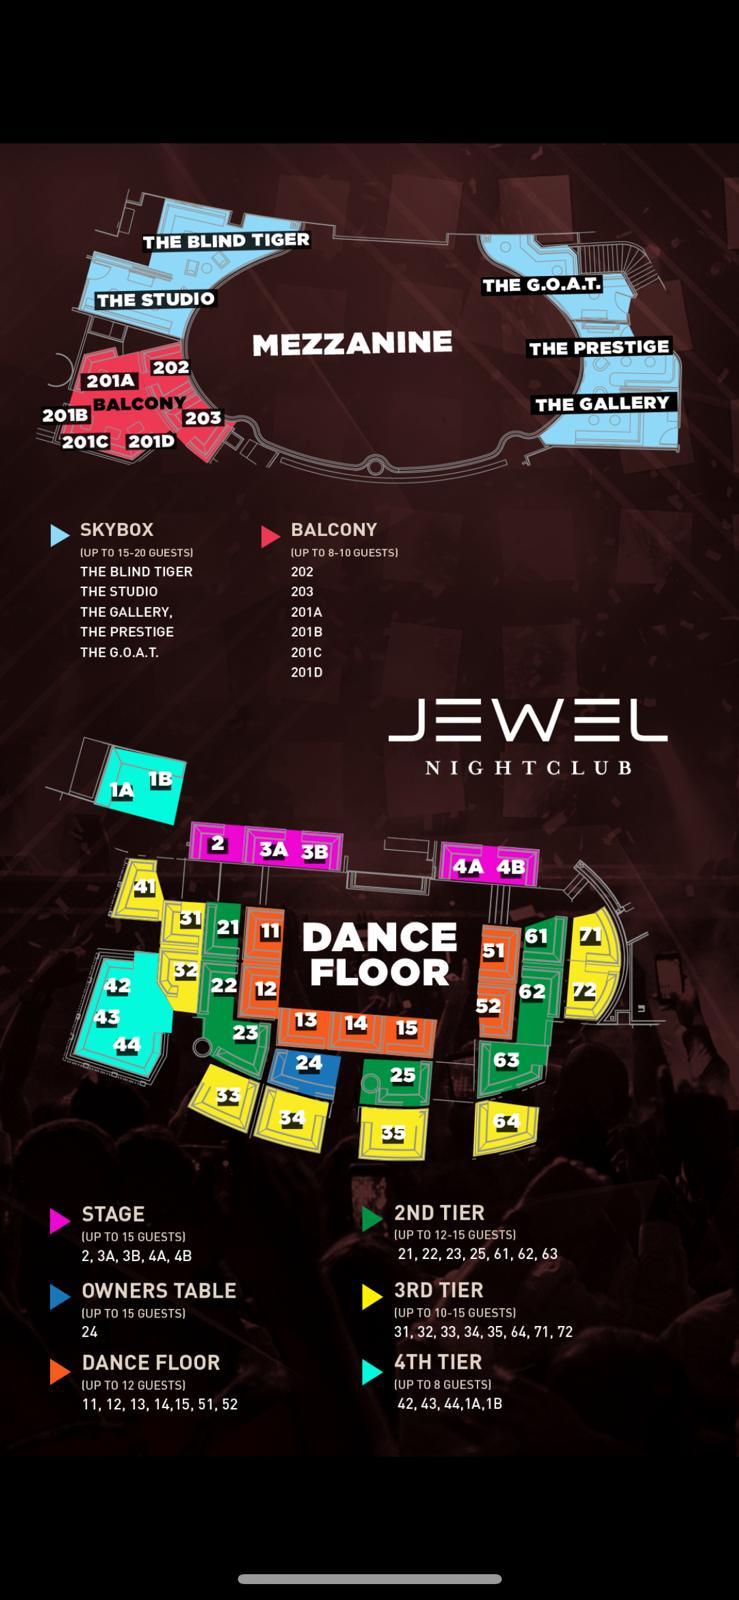 Jewel Las Vegas Table Map